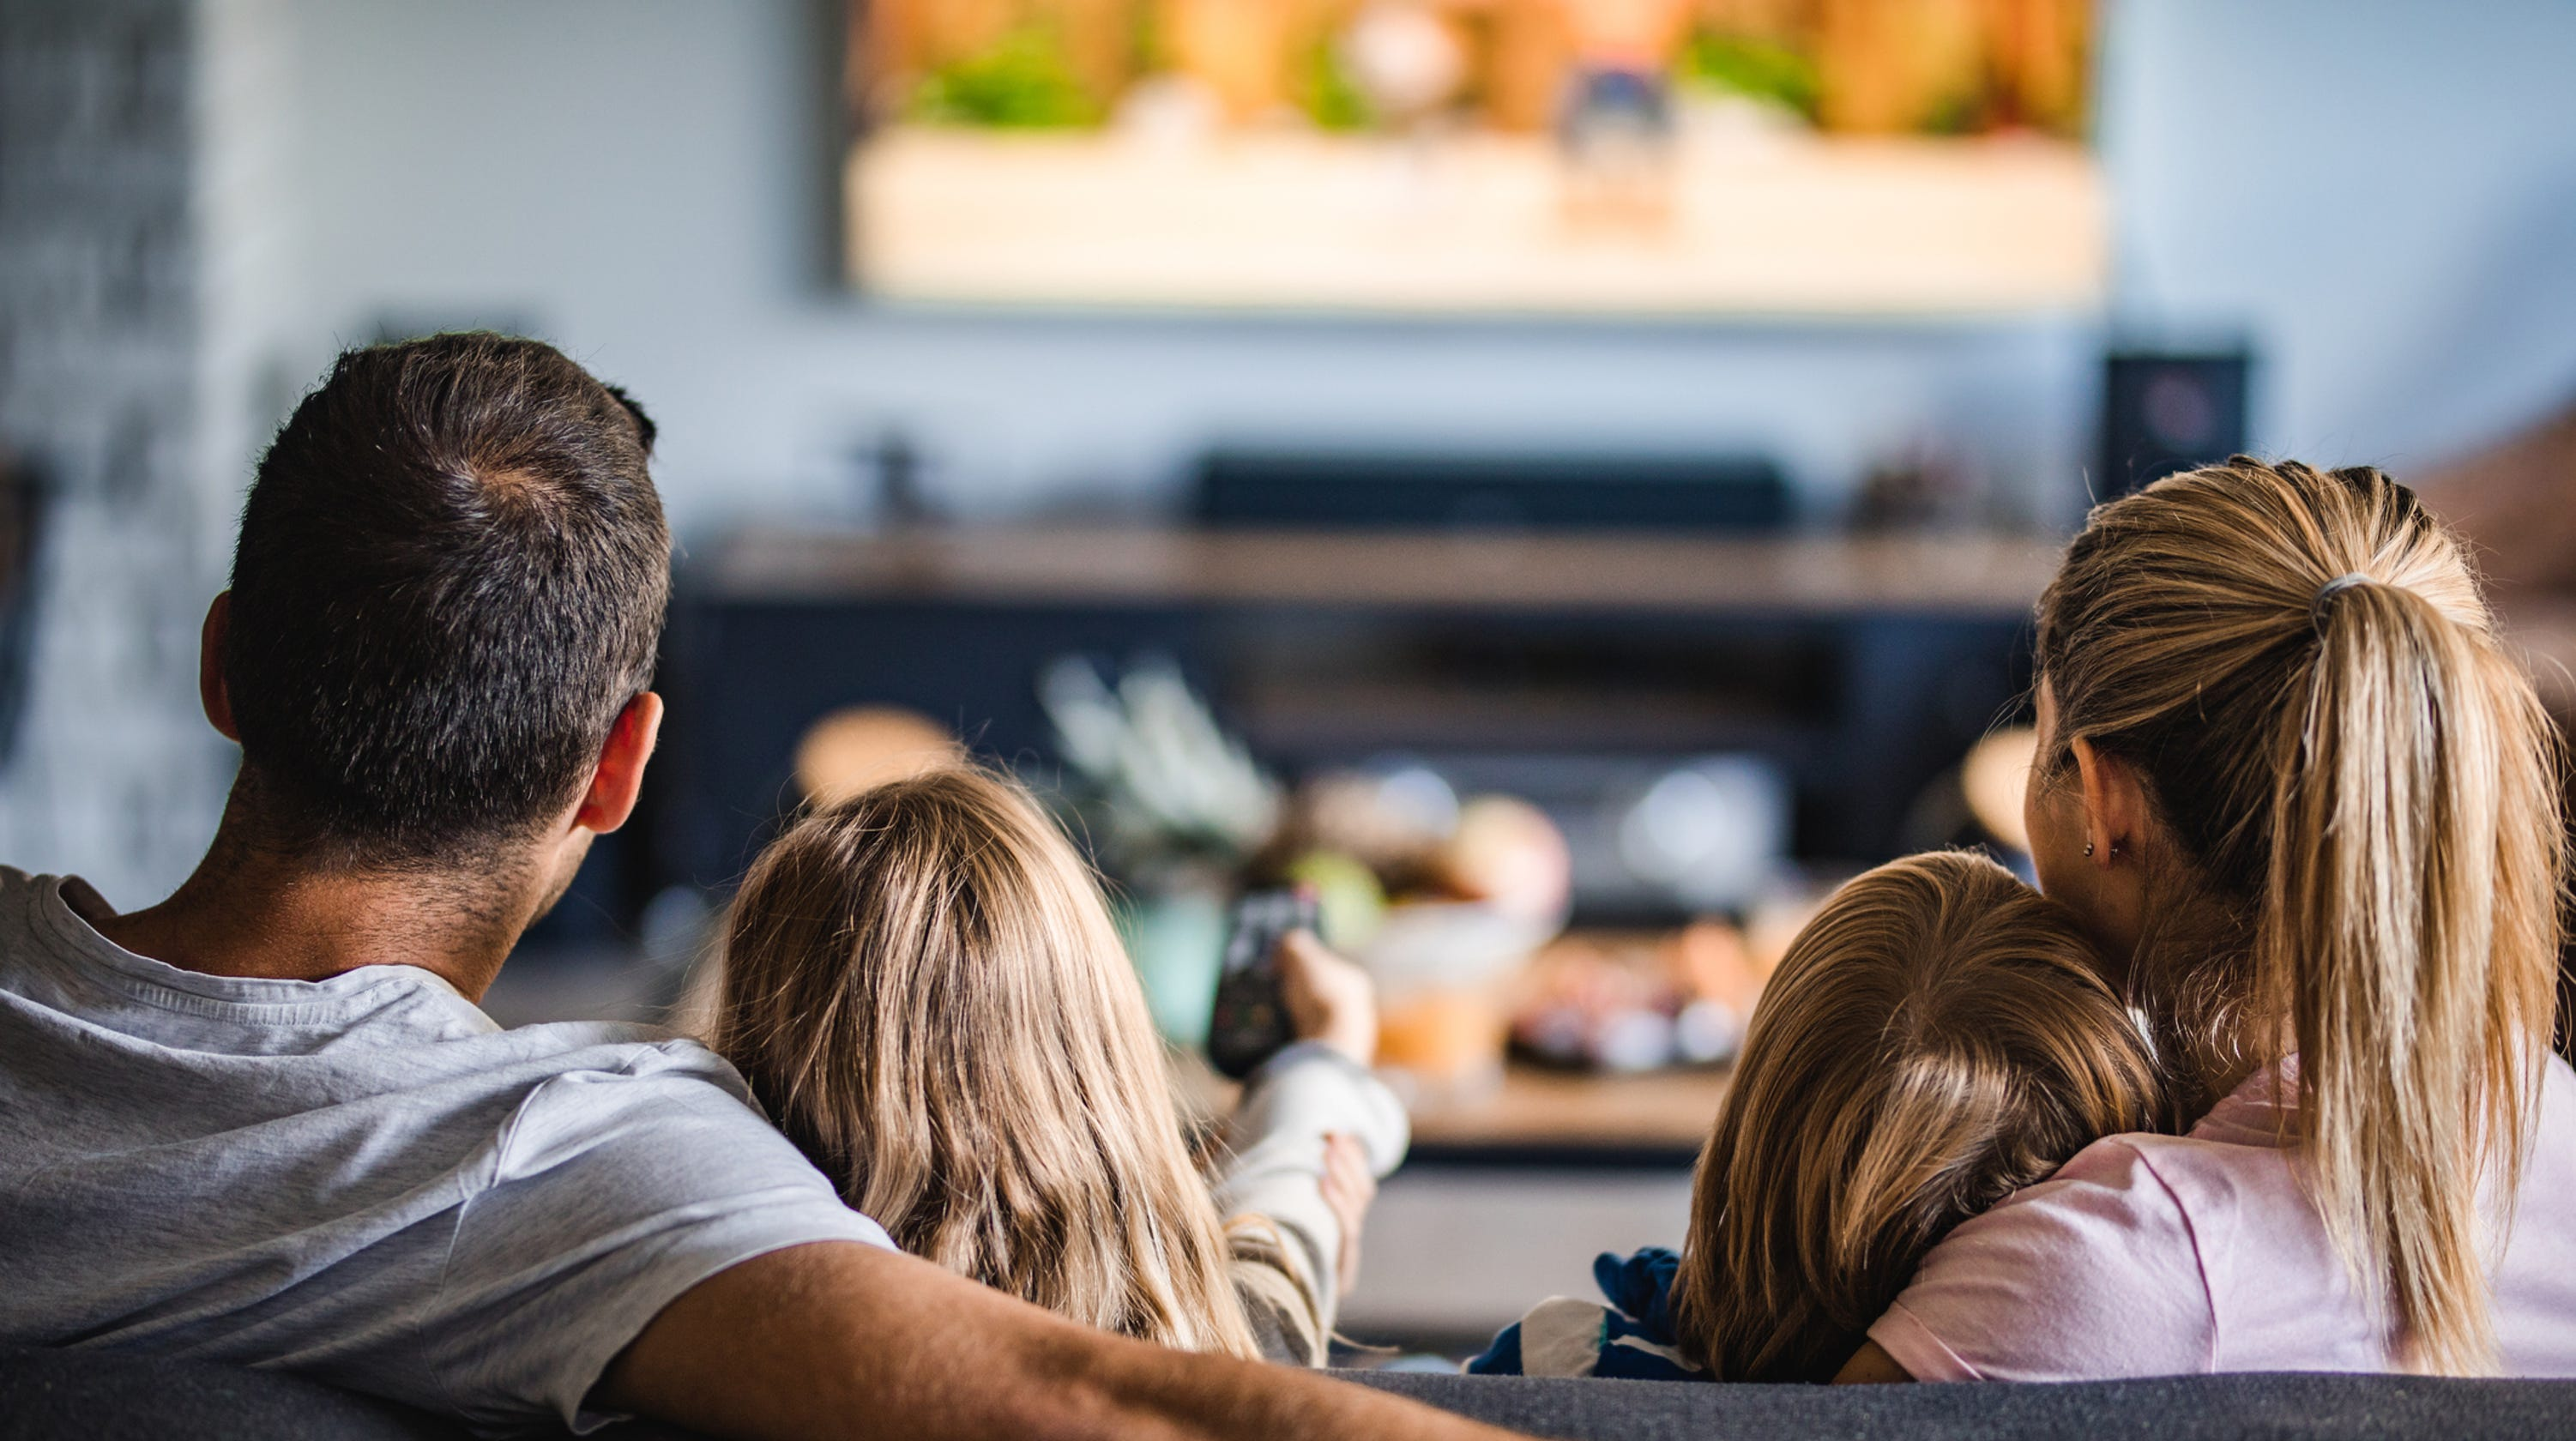 Disney+, Hulu, ESPN+ bundle is a dream come true for parents